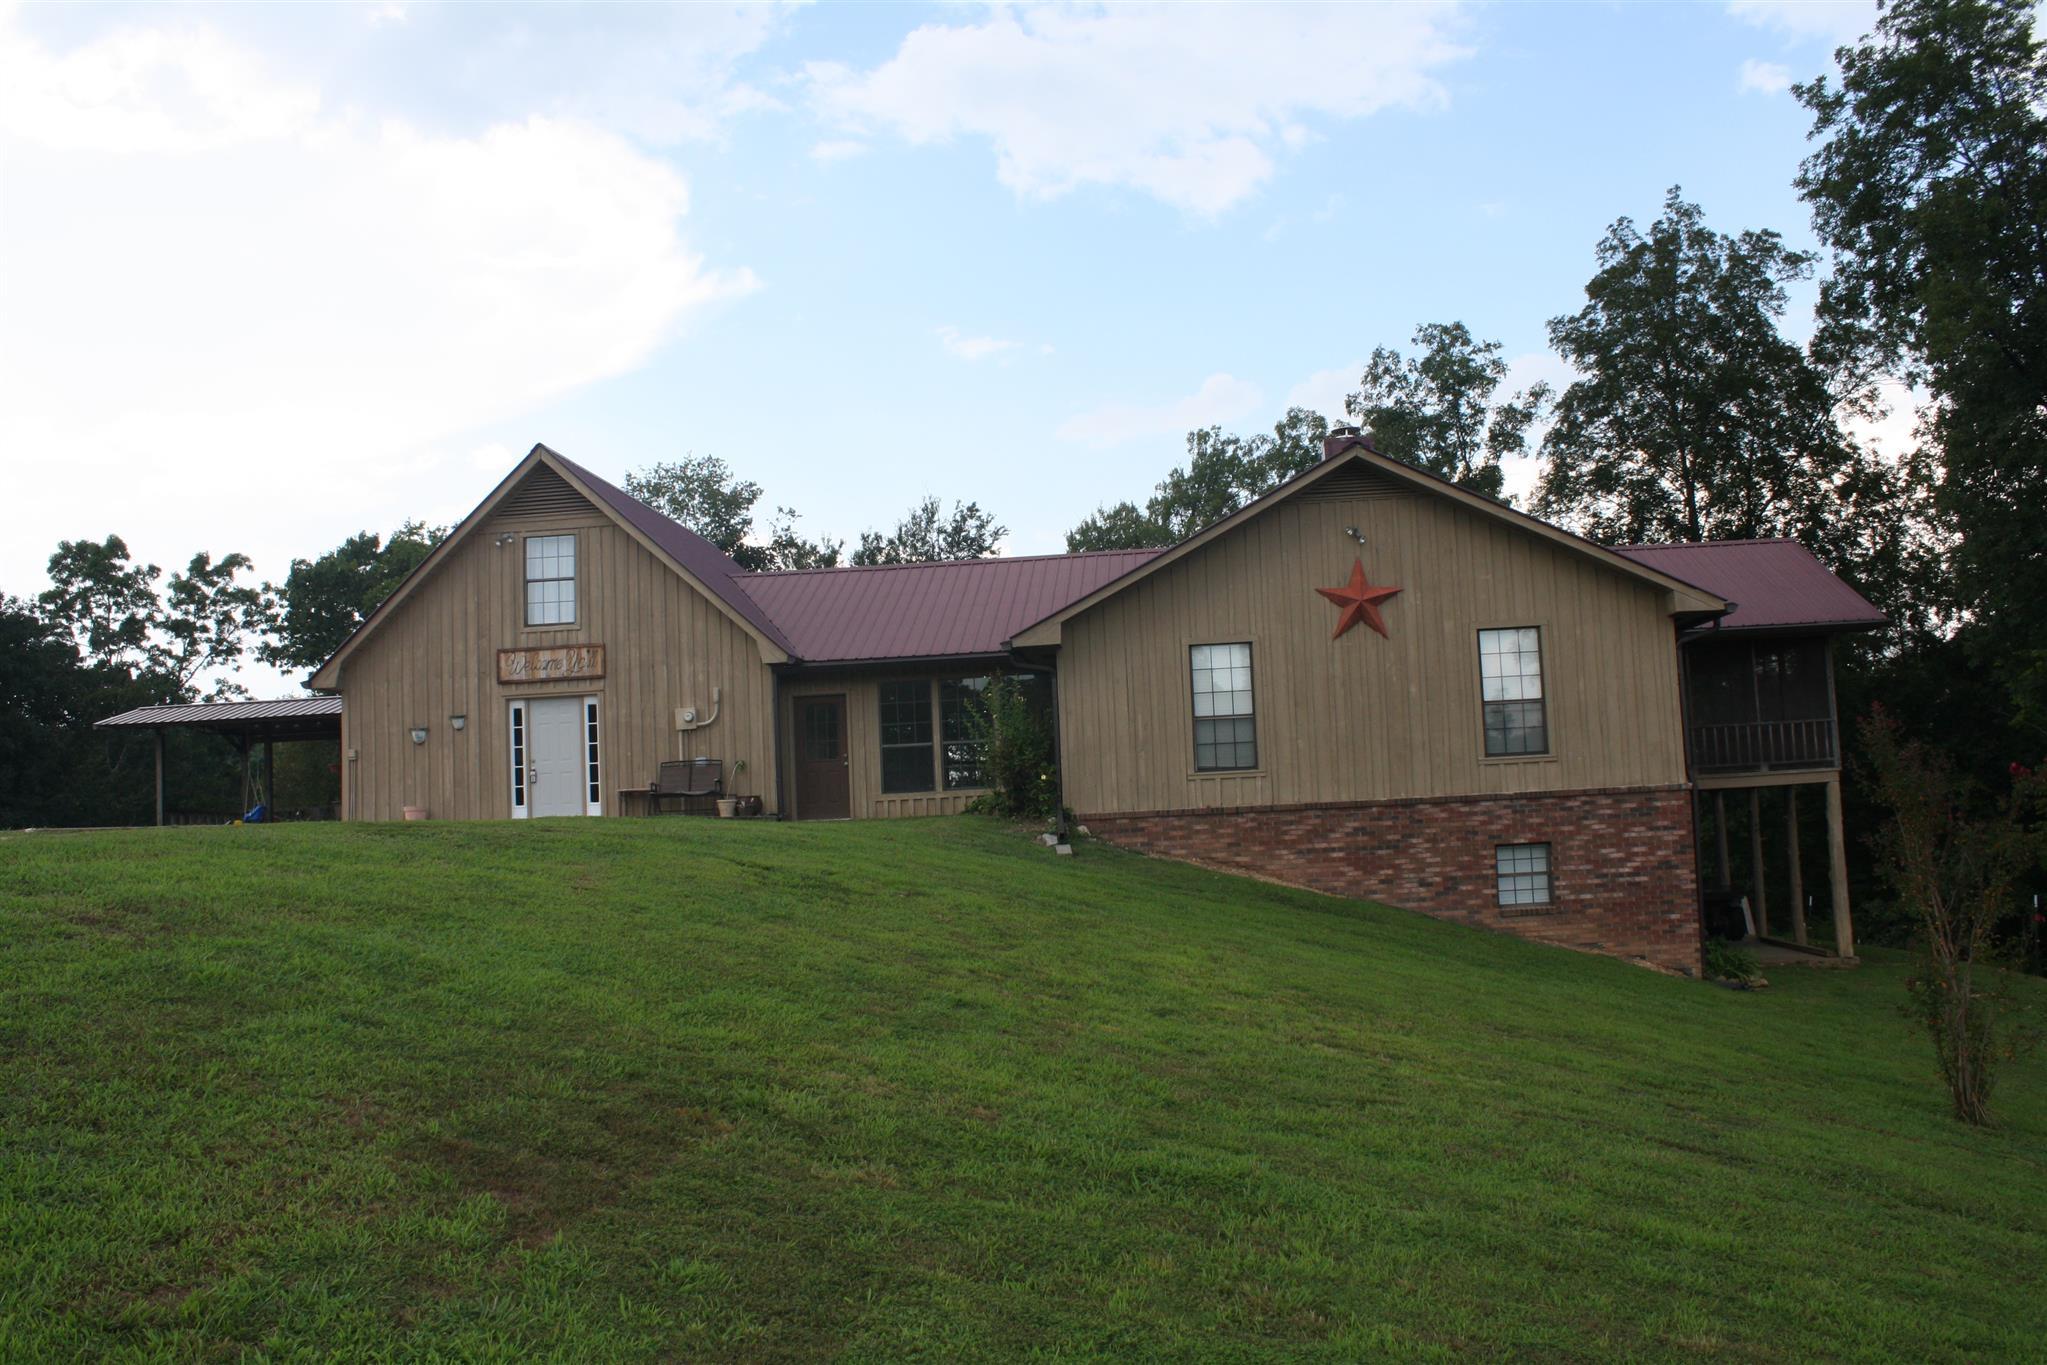 7015 Story Rd, Collinwood, TN 38450